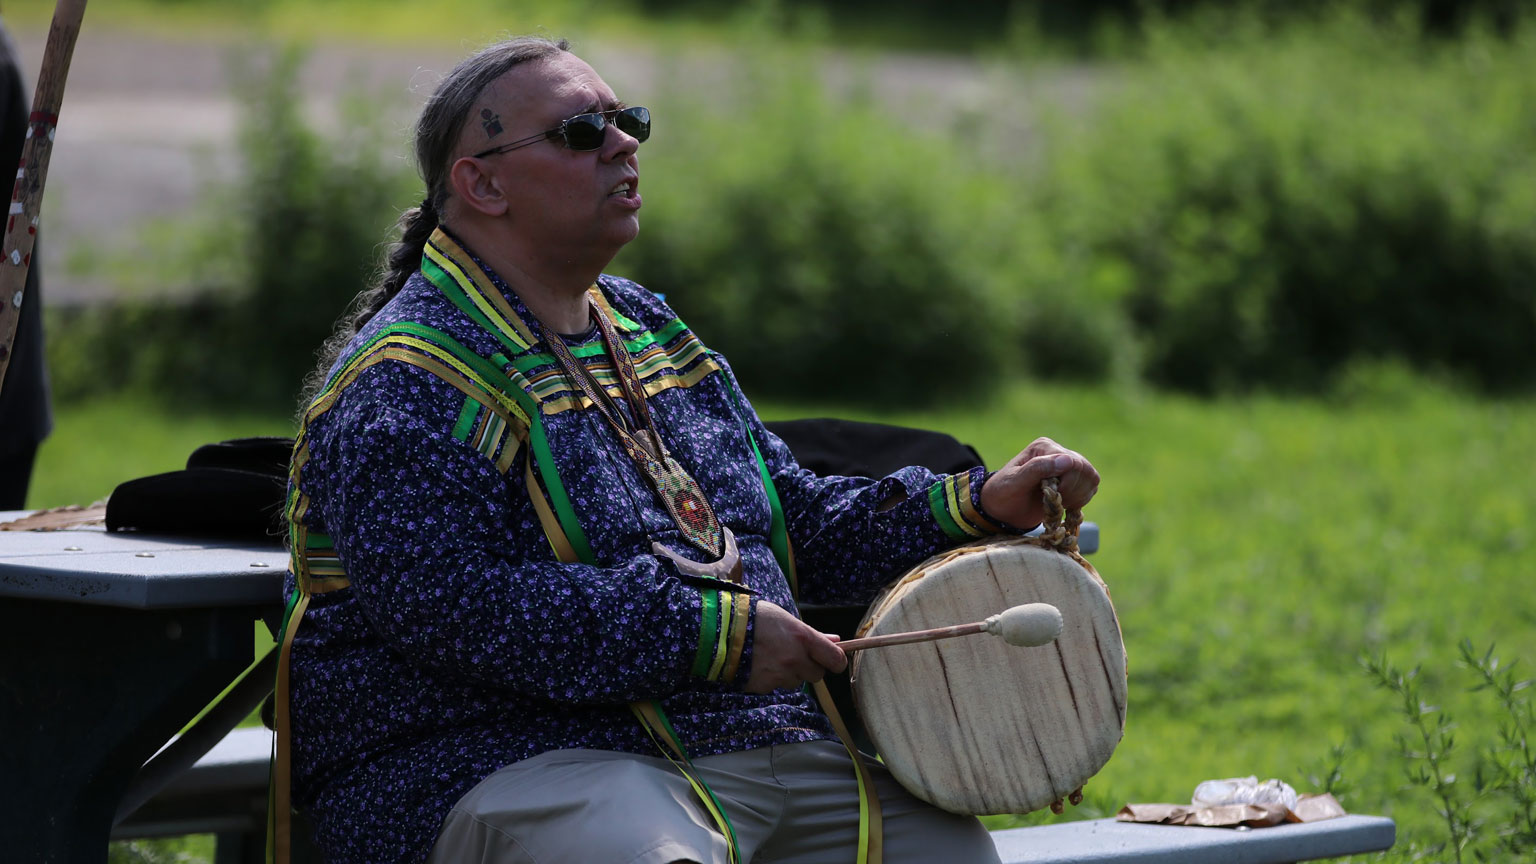 The Lenape Nation of Pennsylvania's Rising Nation River Journey, August 2018